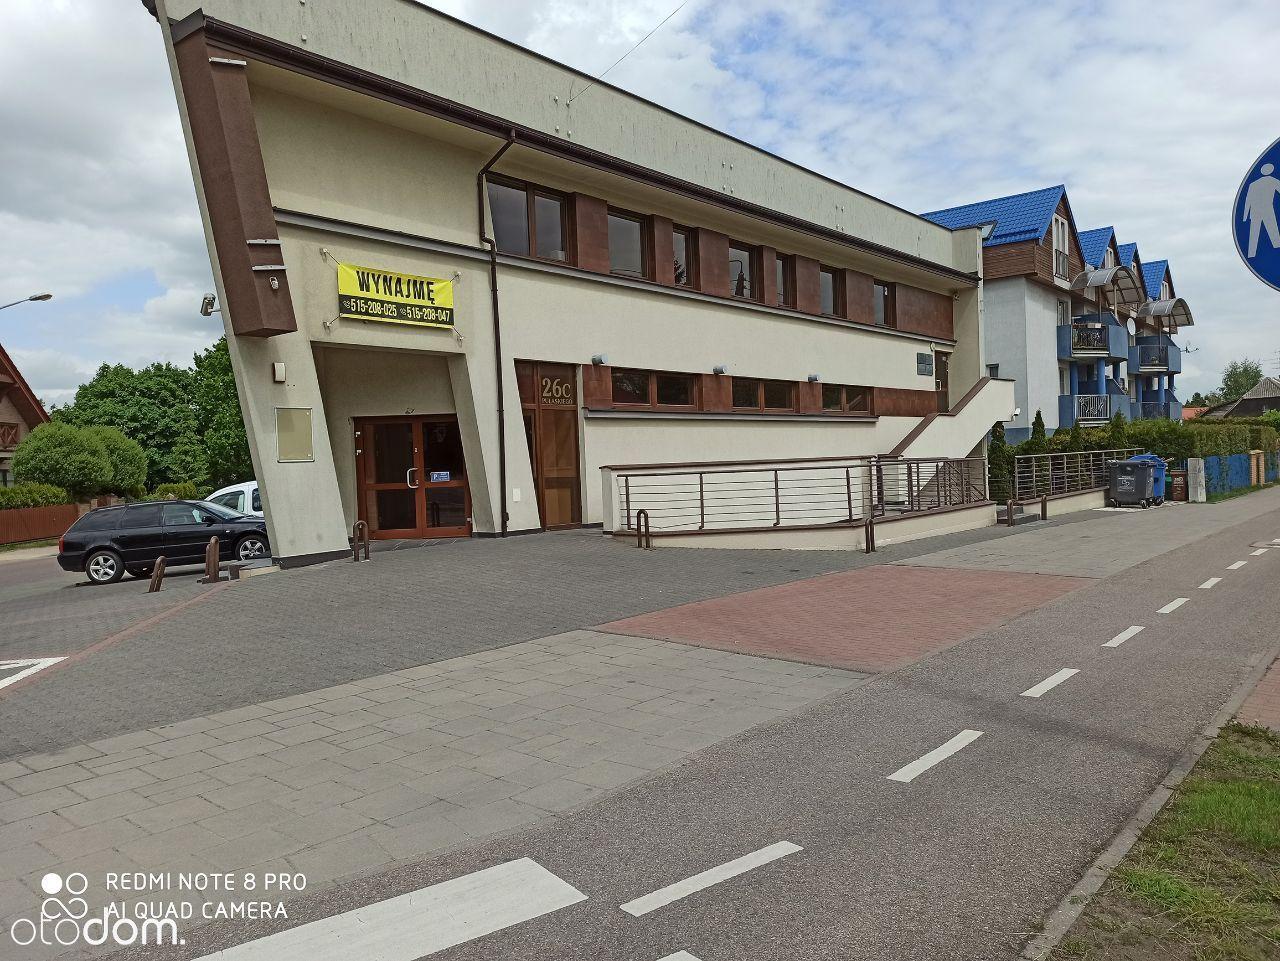 Lokal 225 m2 parter ul.Pułaskiego 26 c